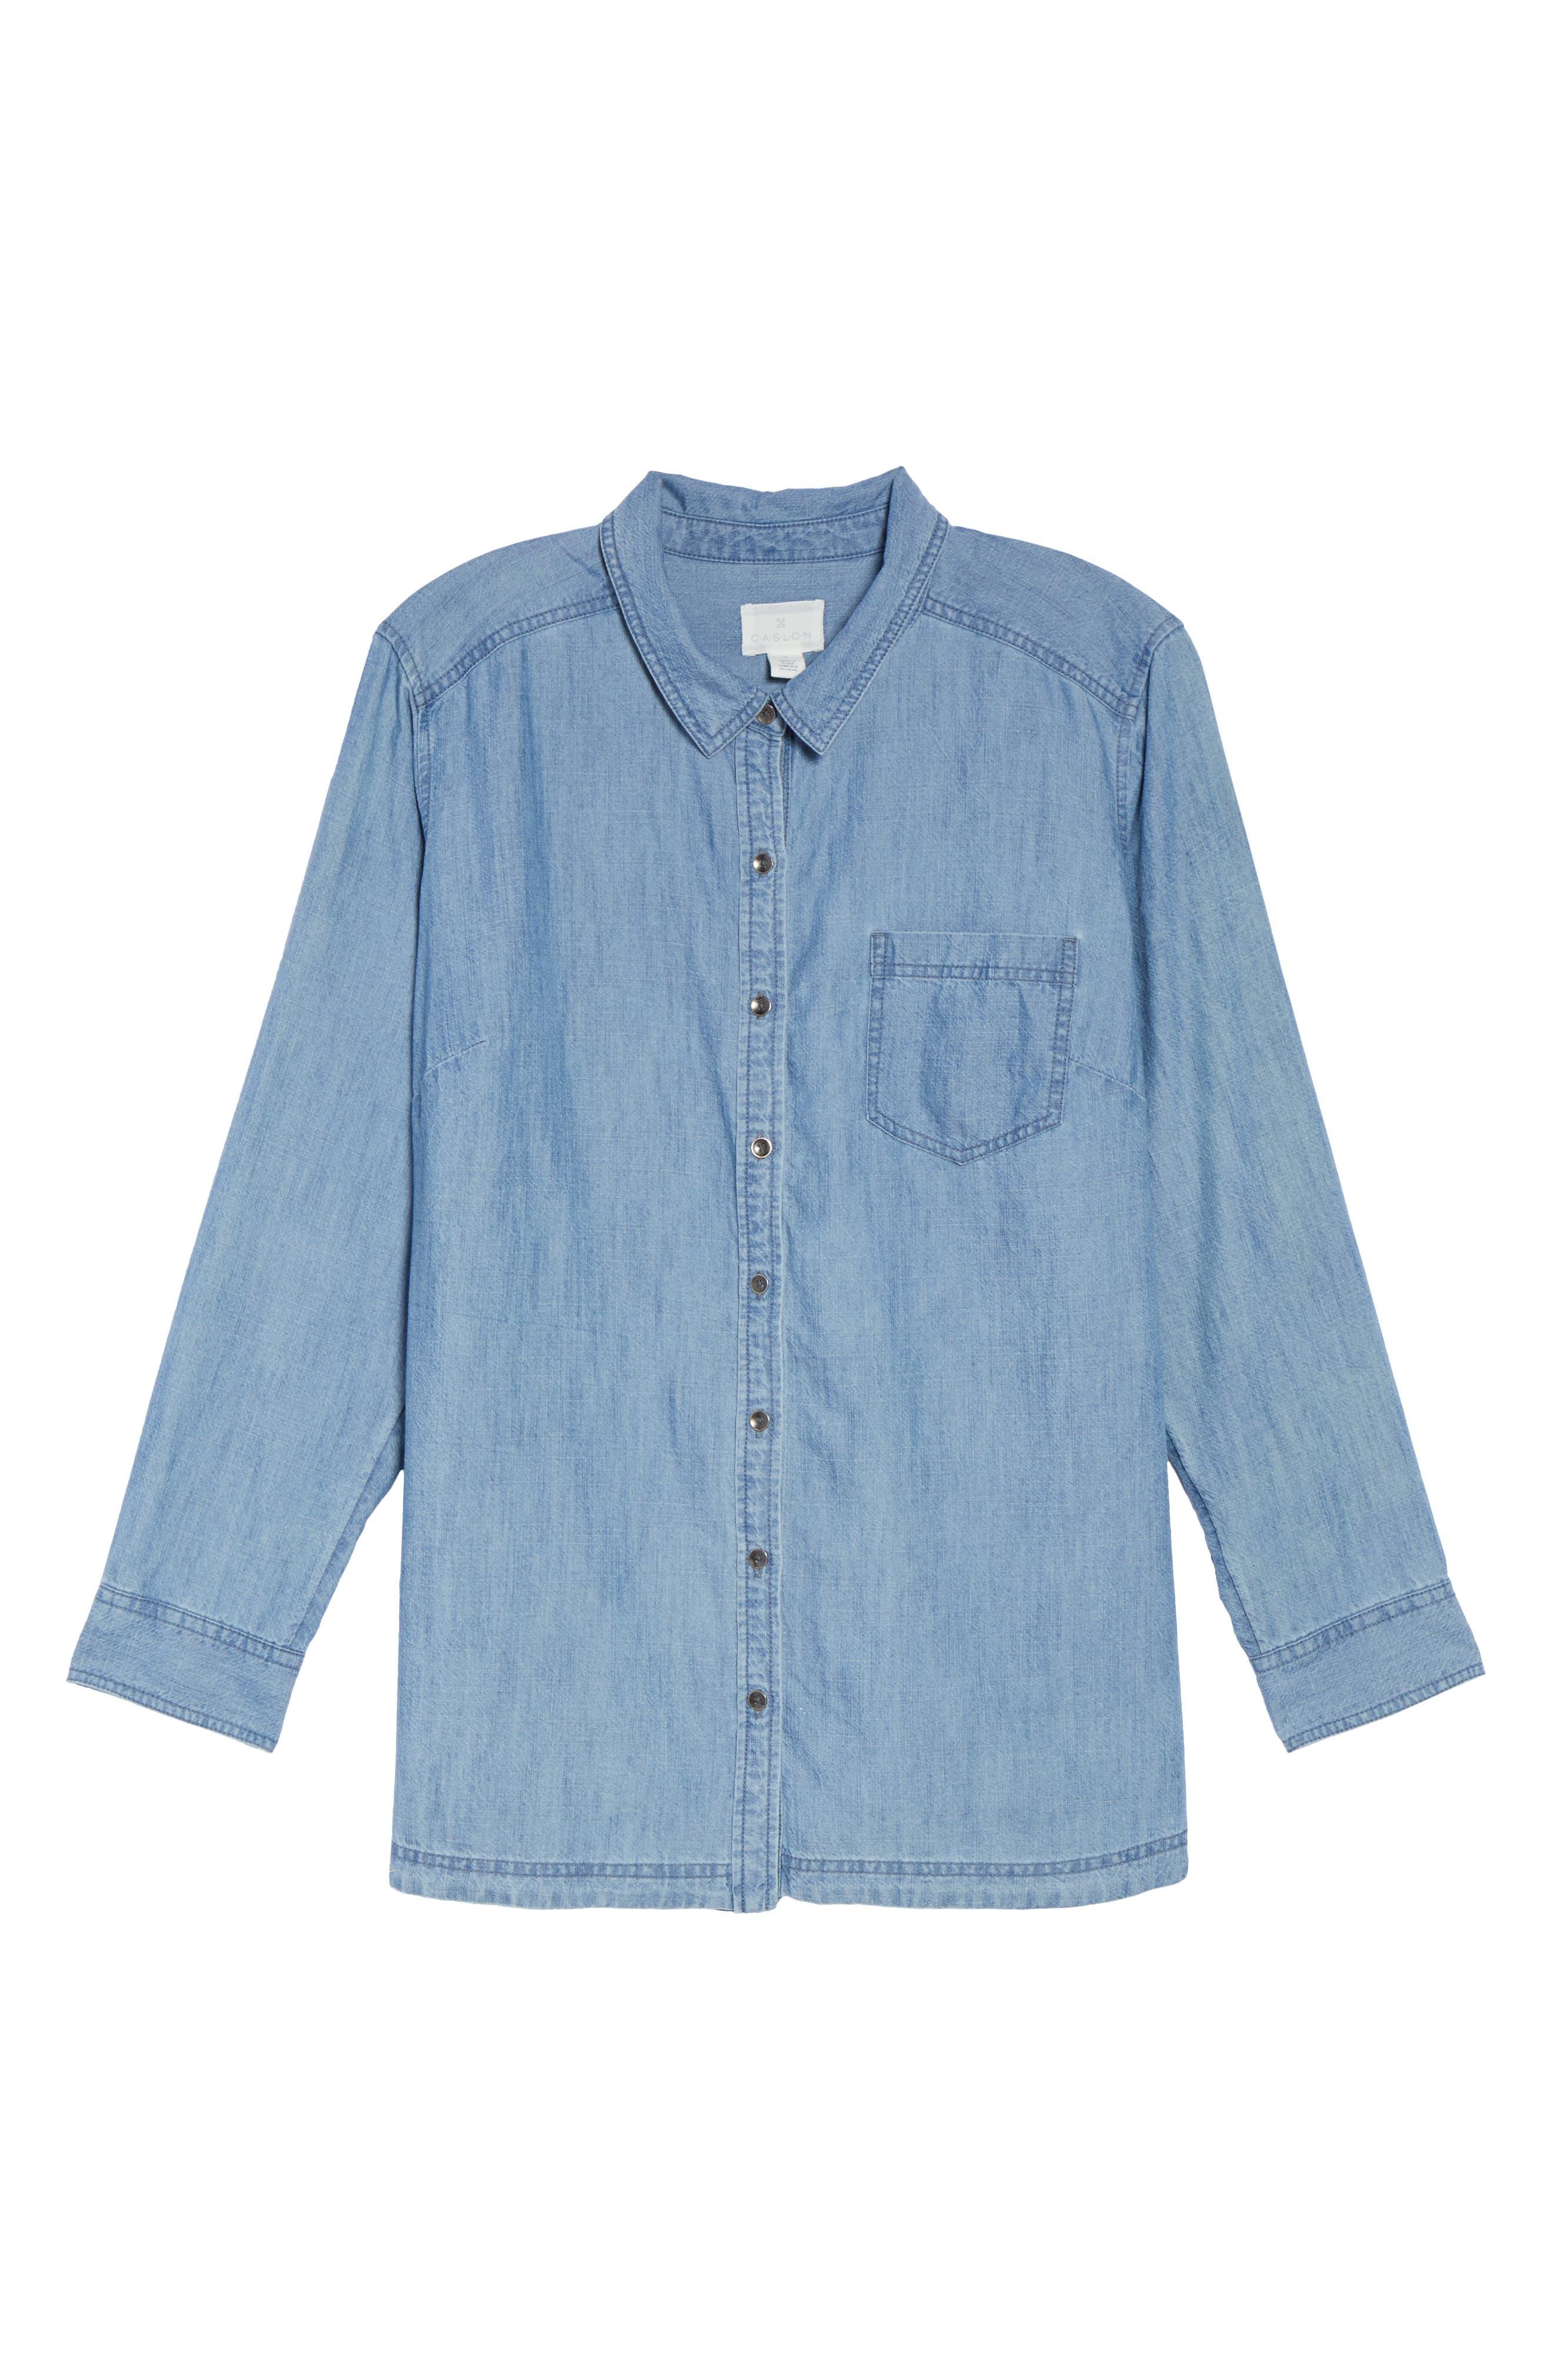 Button Front Chambray Shirt,                             Alternate thumbnail 6, color,                             Chambray